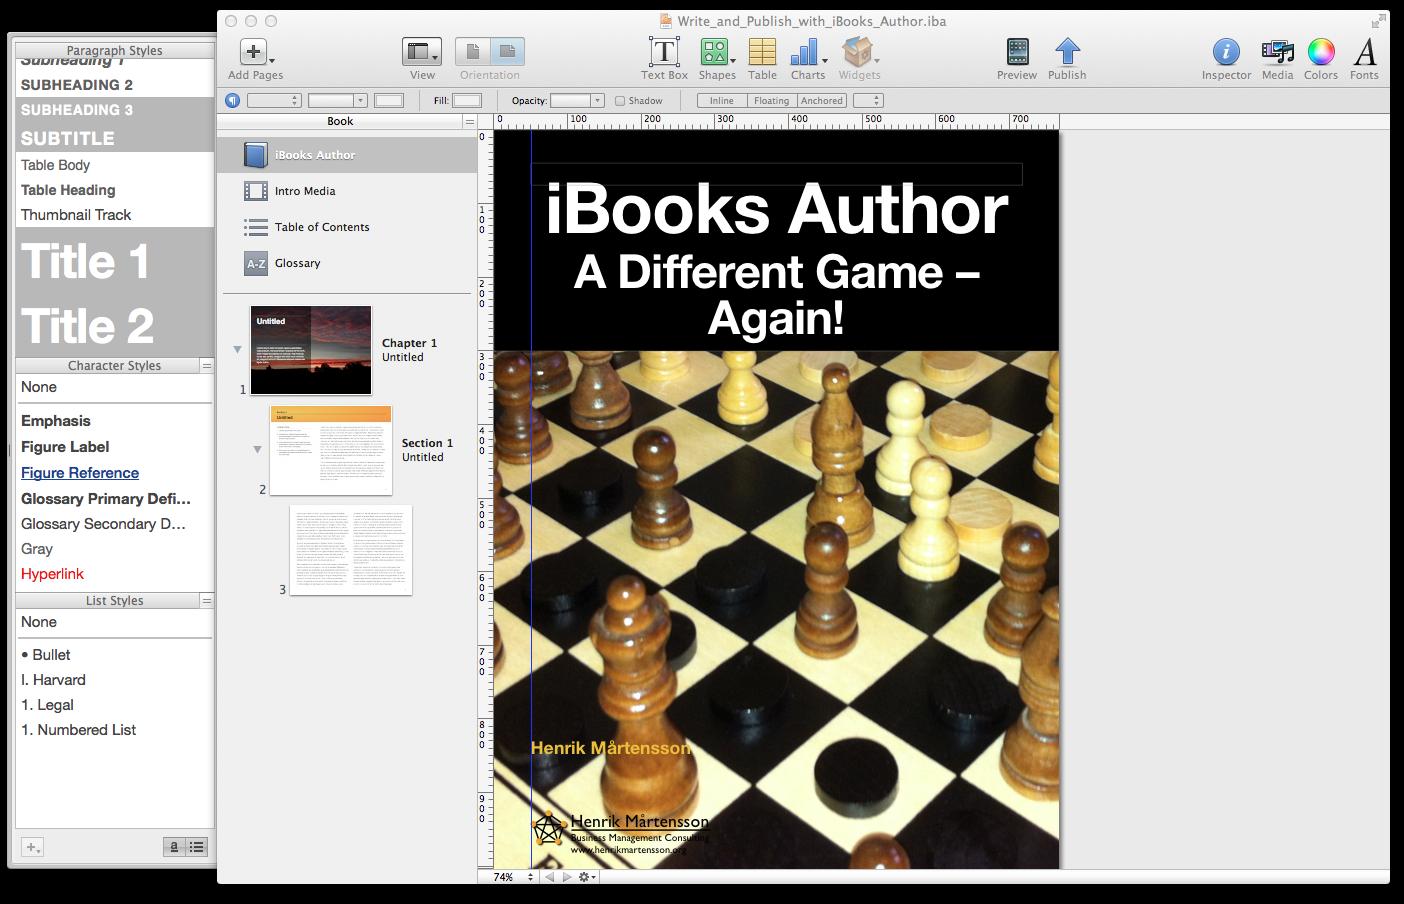 Kallokain: iBook Author – Apple Changes the Game Again!